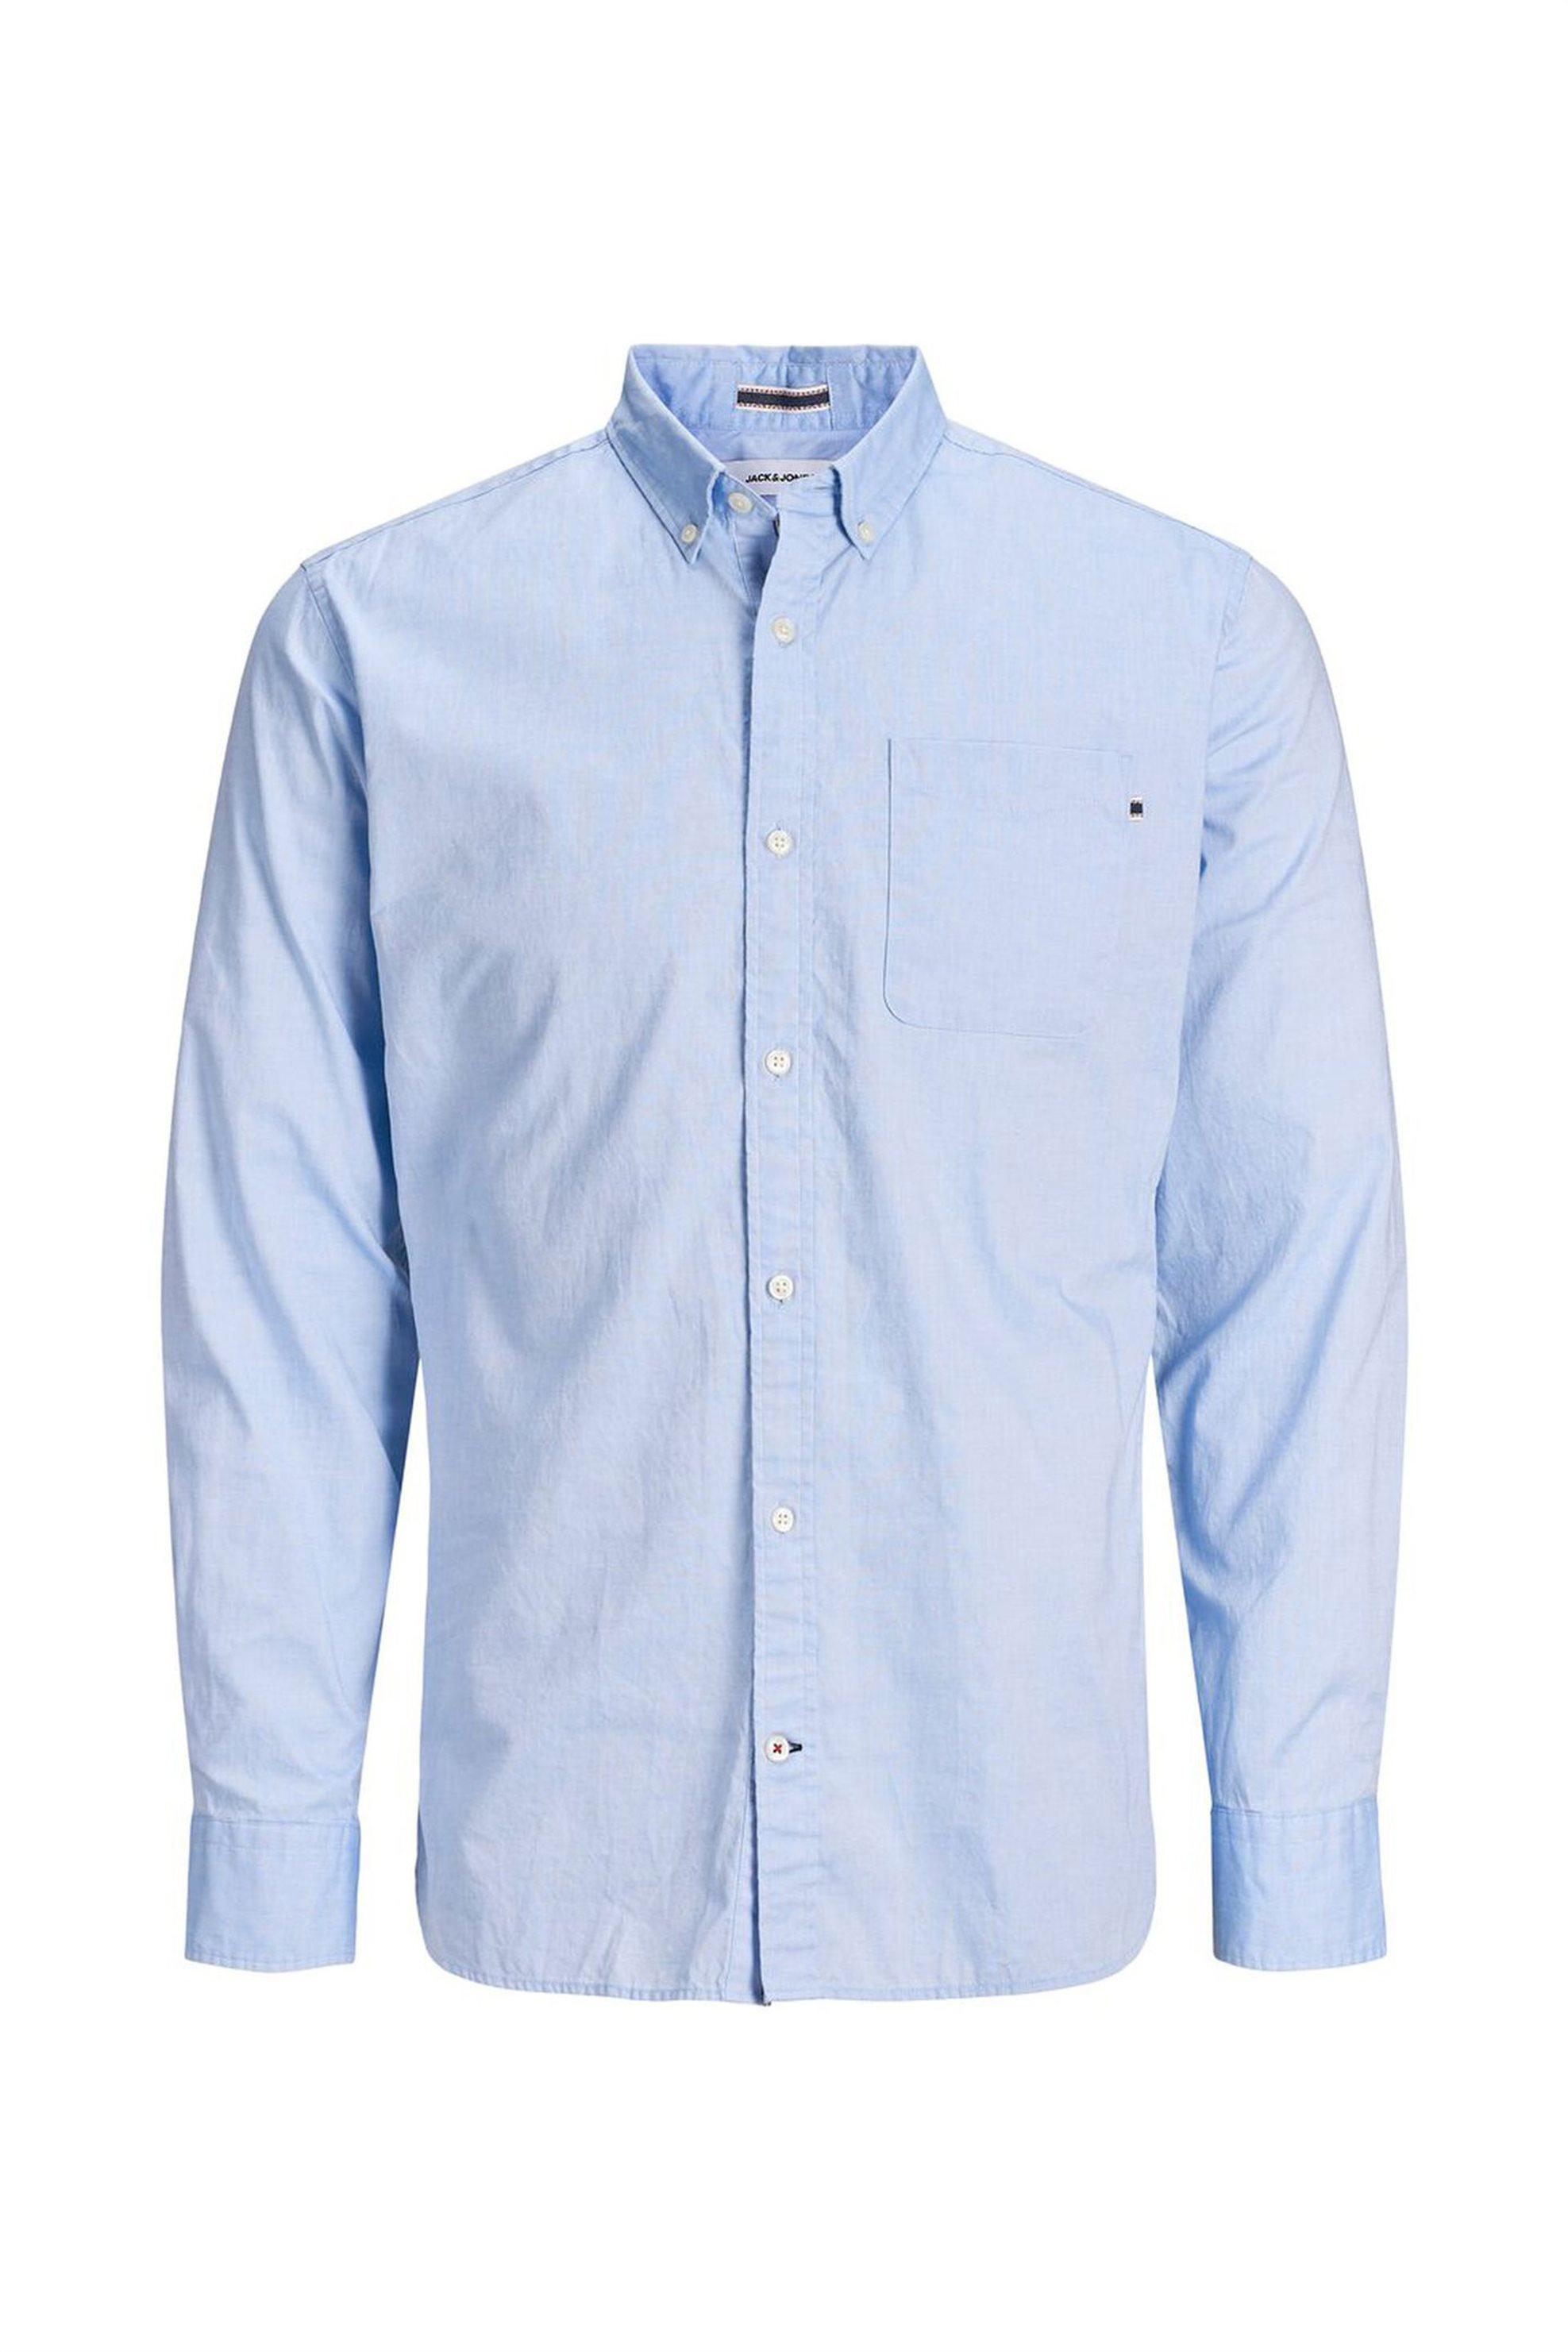 JACK & JONES ανδρικό πουκάμισο με button down γιακά - 12172736 - Γαλάζιο